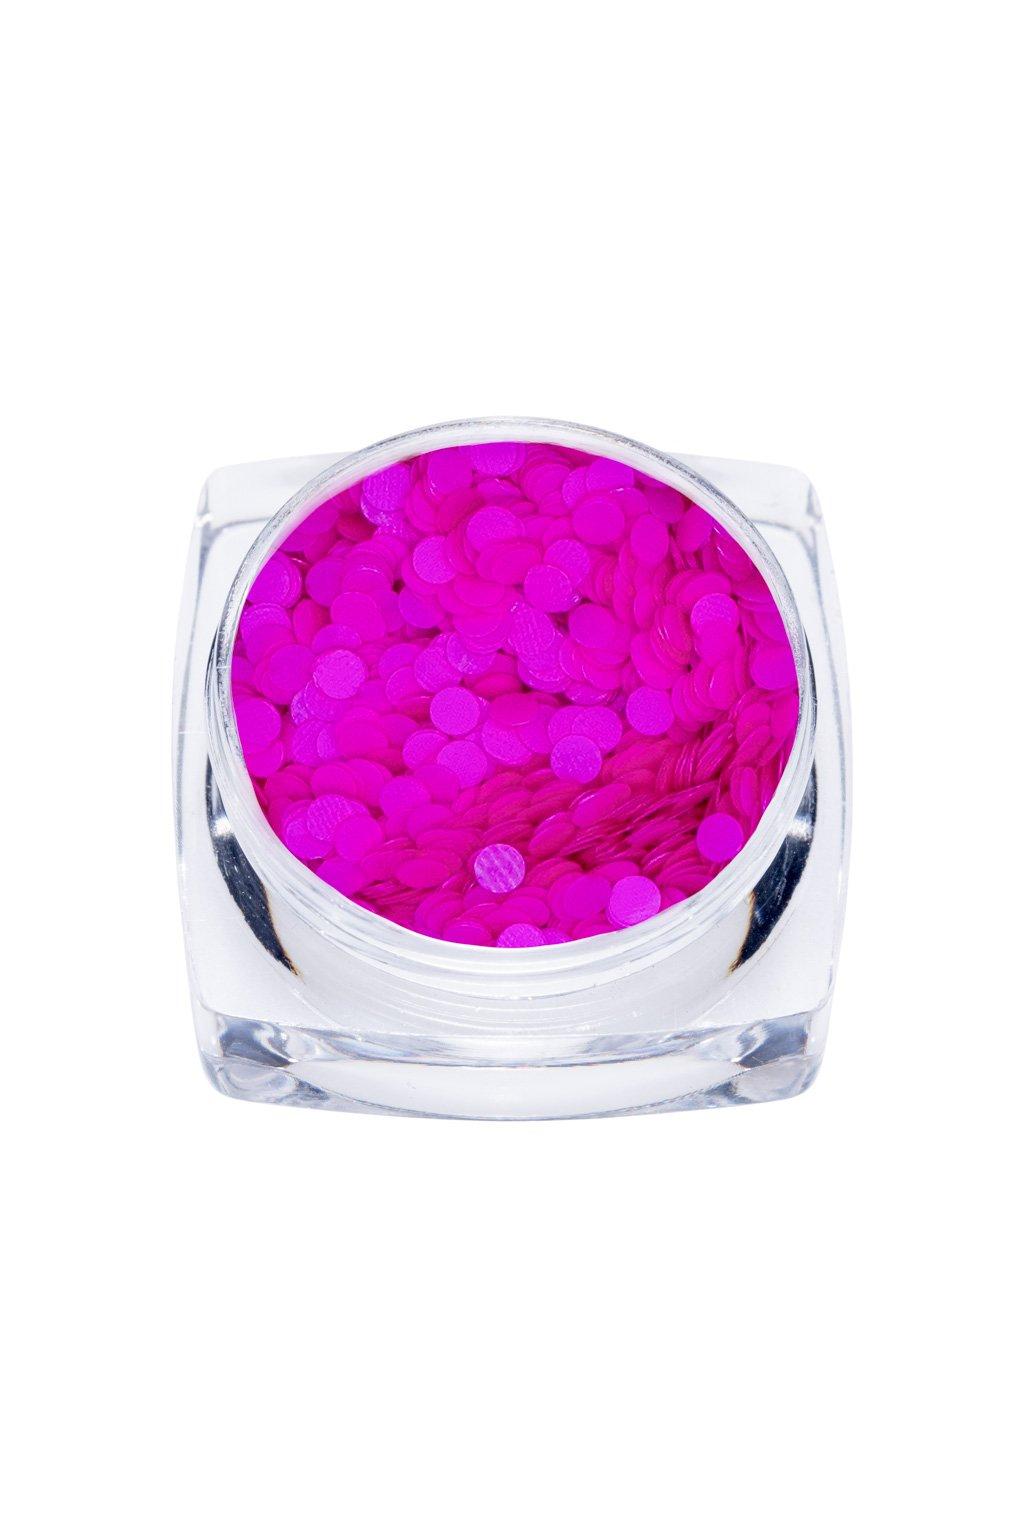 23972 minipihy neon pink 2mm